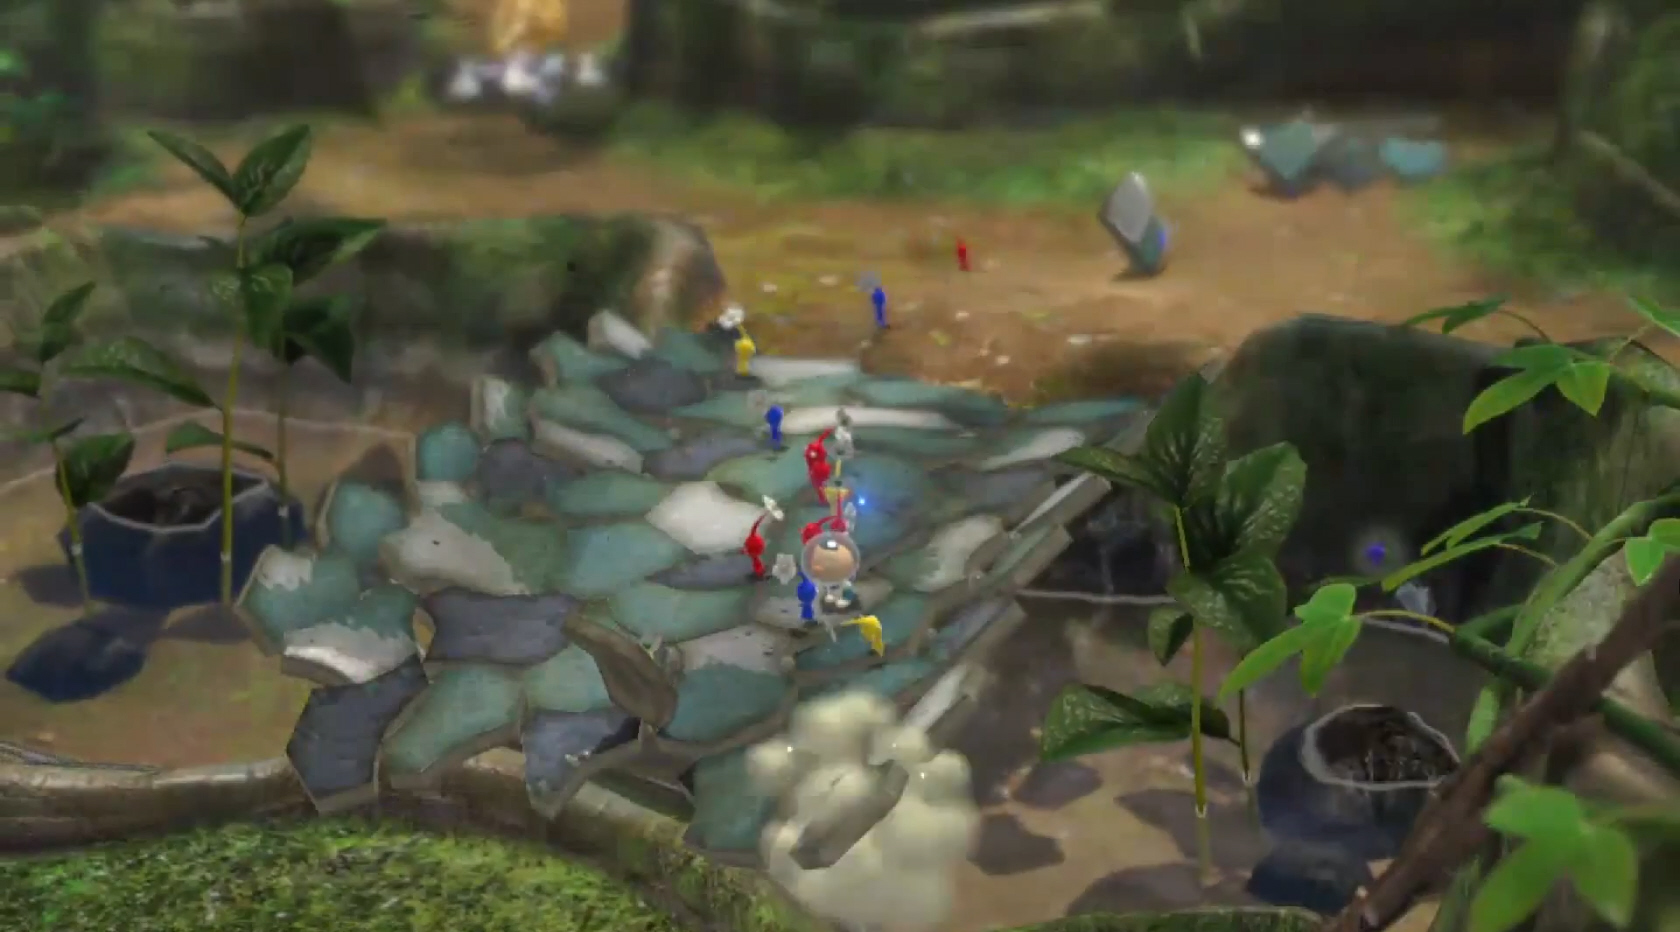 Pikmin 3 Gameplay Wii U E3 2012 Stage Demo Reveals Beautiful World